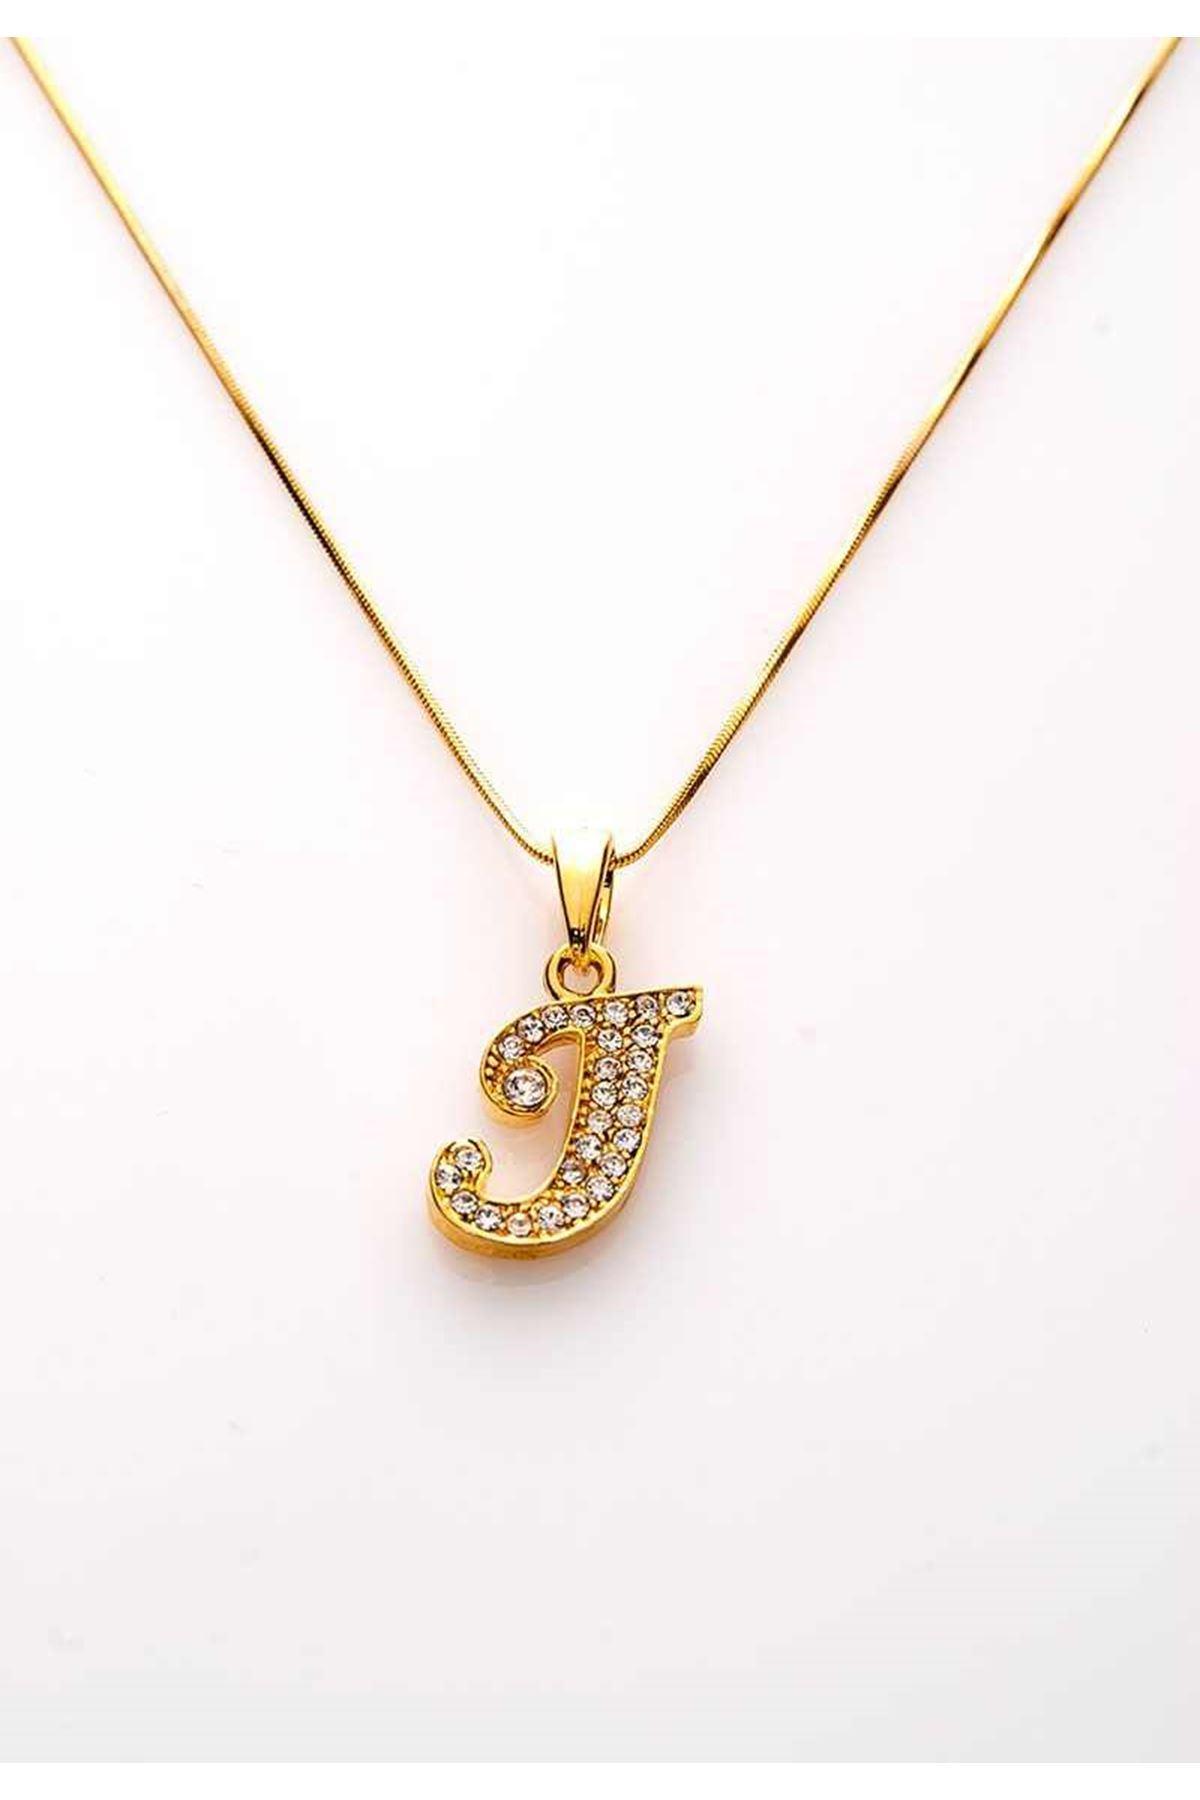 Gold Taşlı J Harf Kolye 11Ç-107846